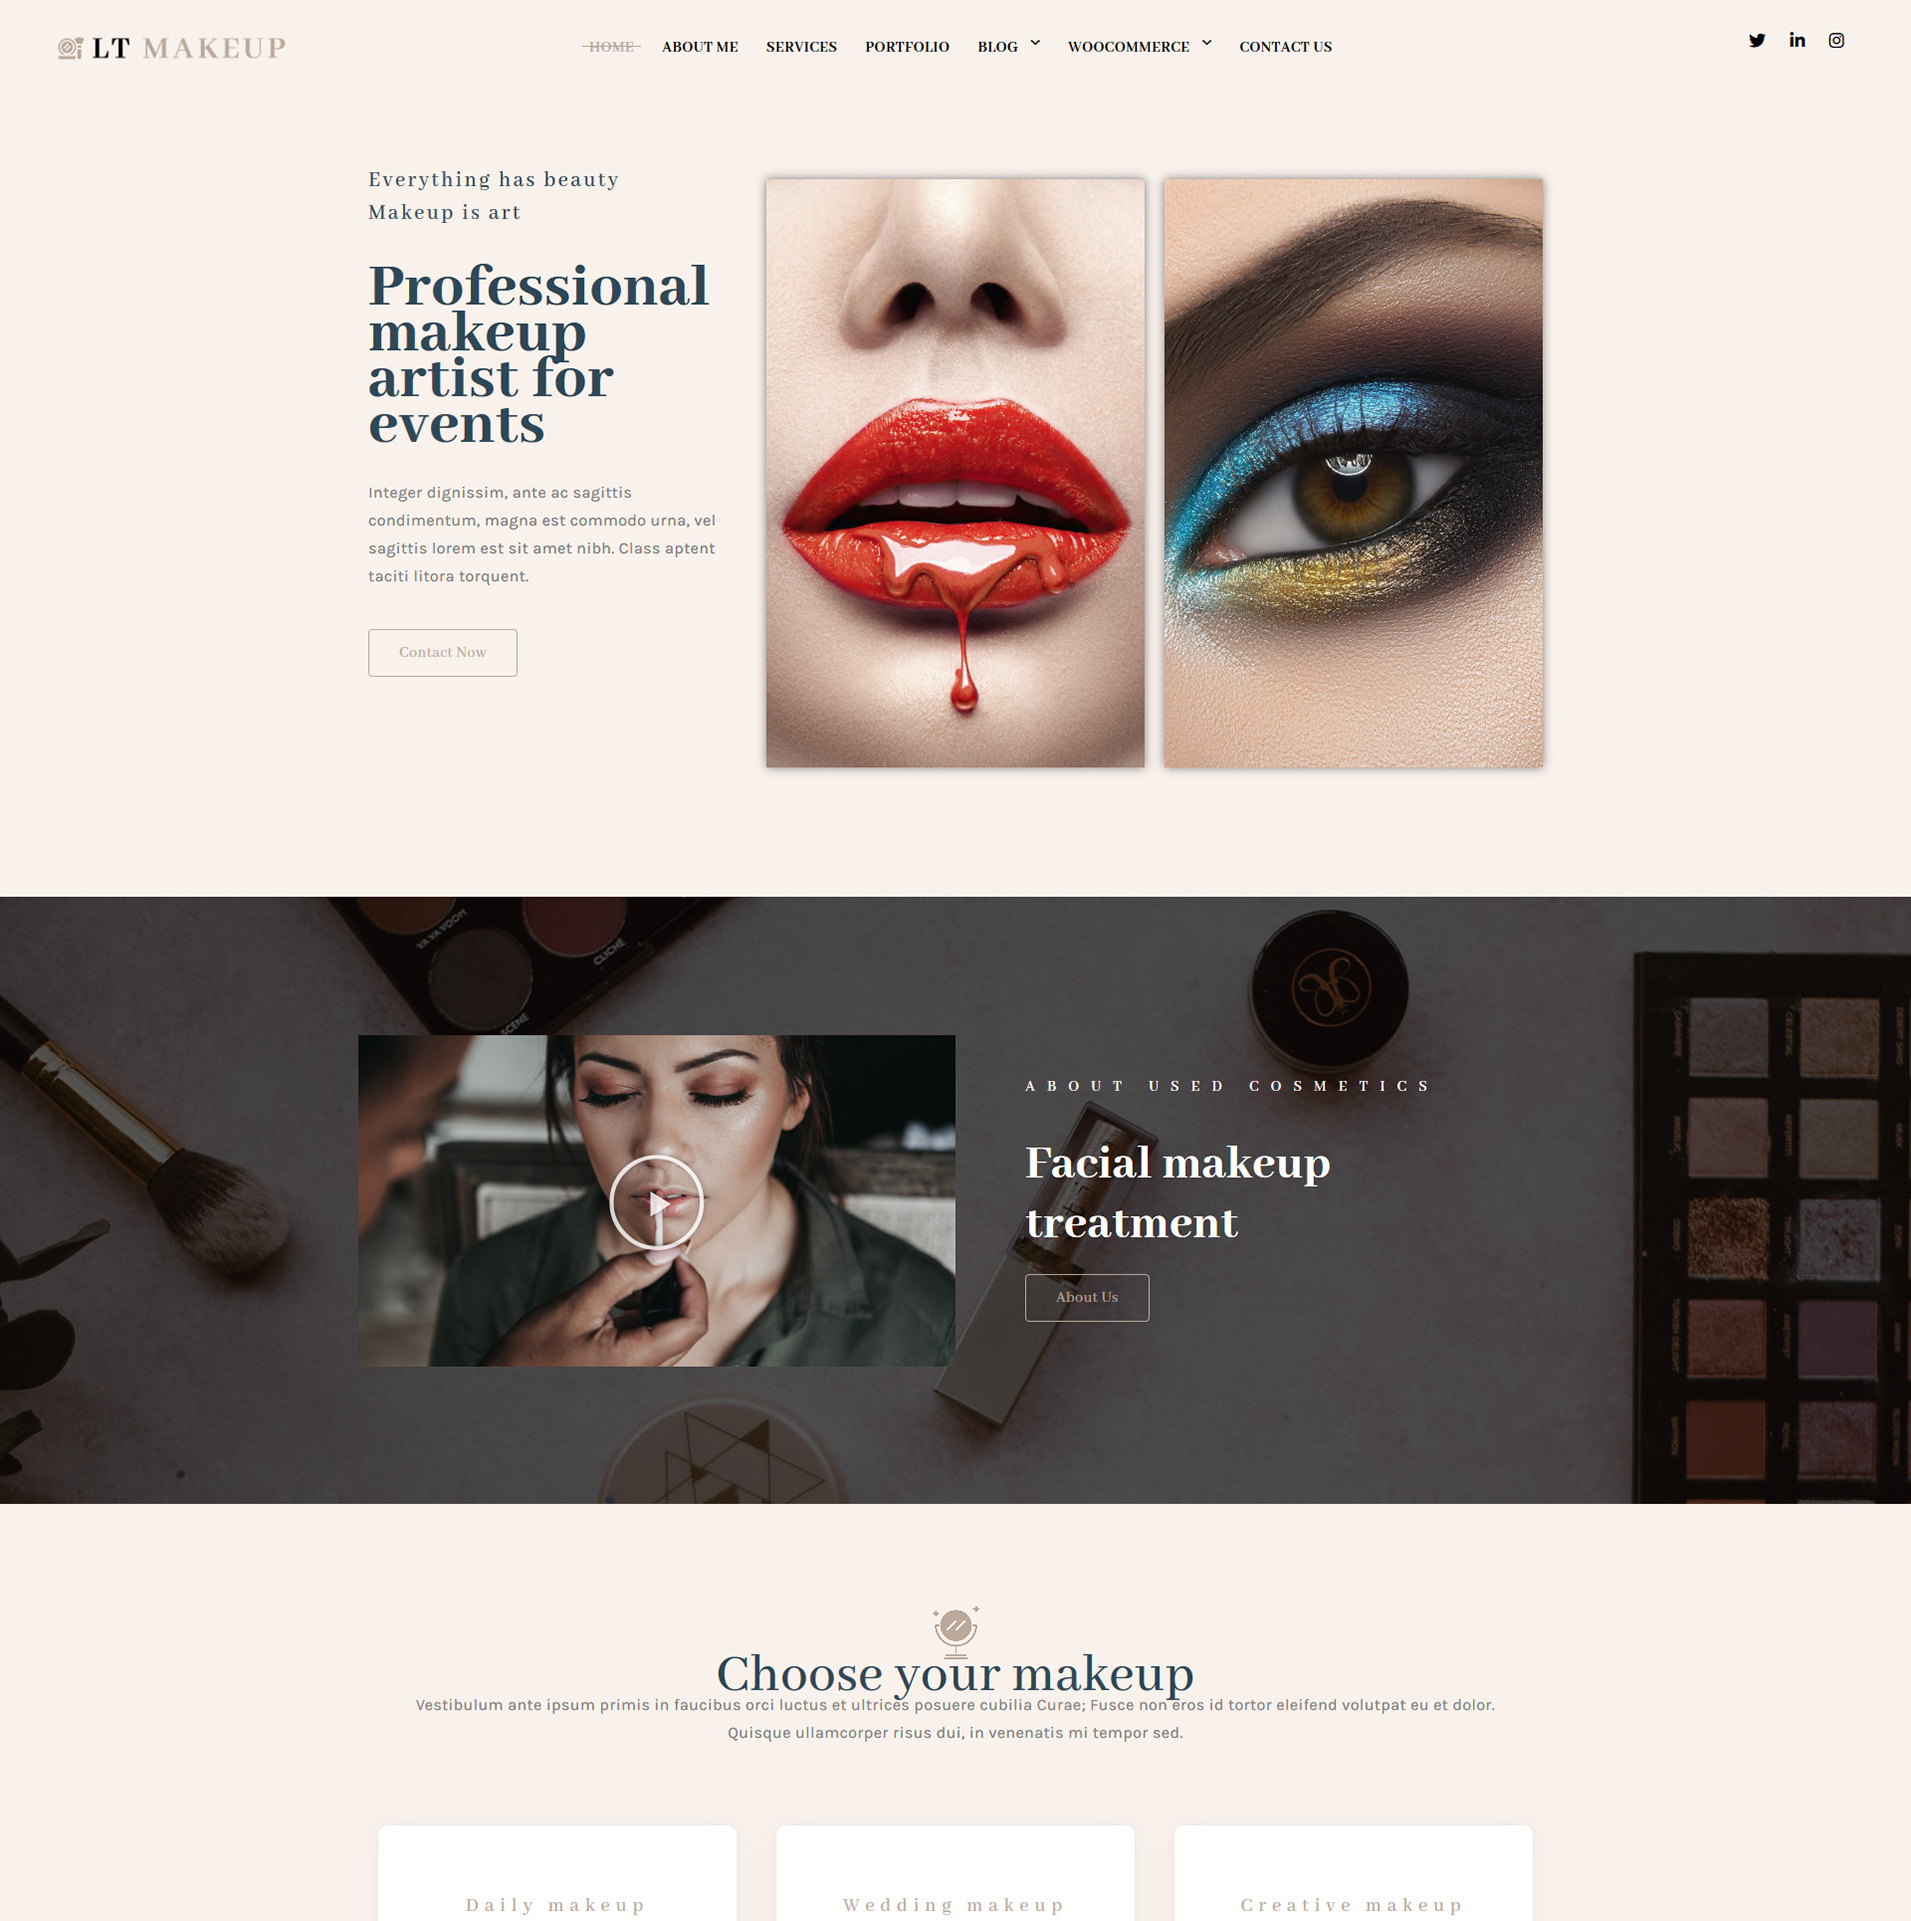 lt-makeup-wordpress-theme-full